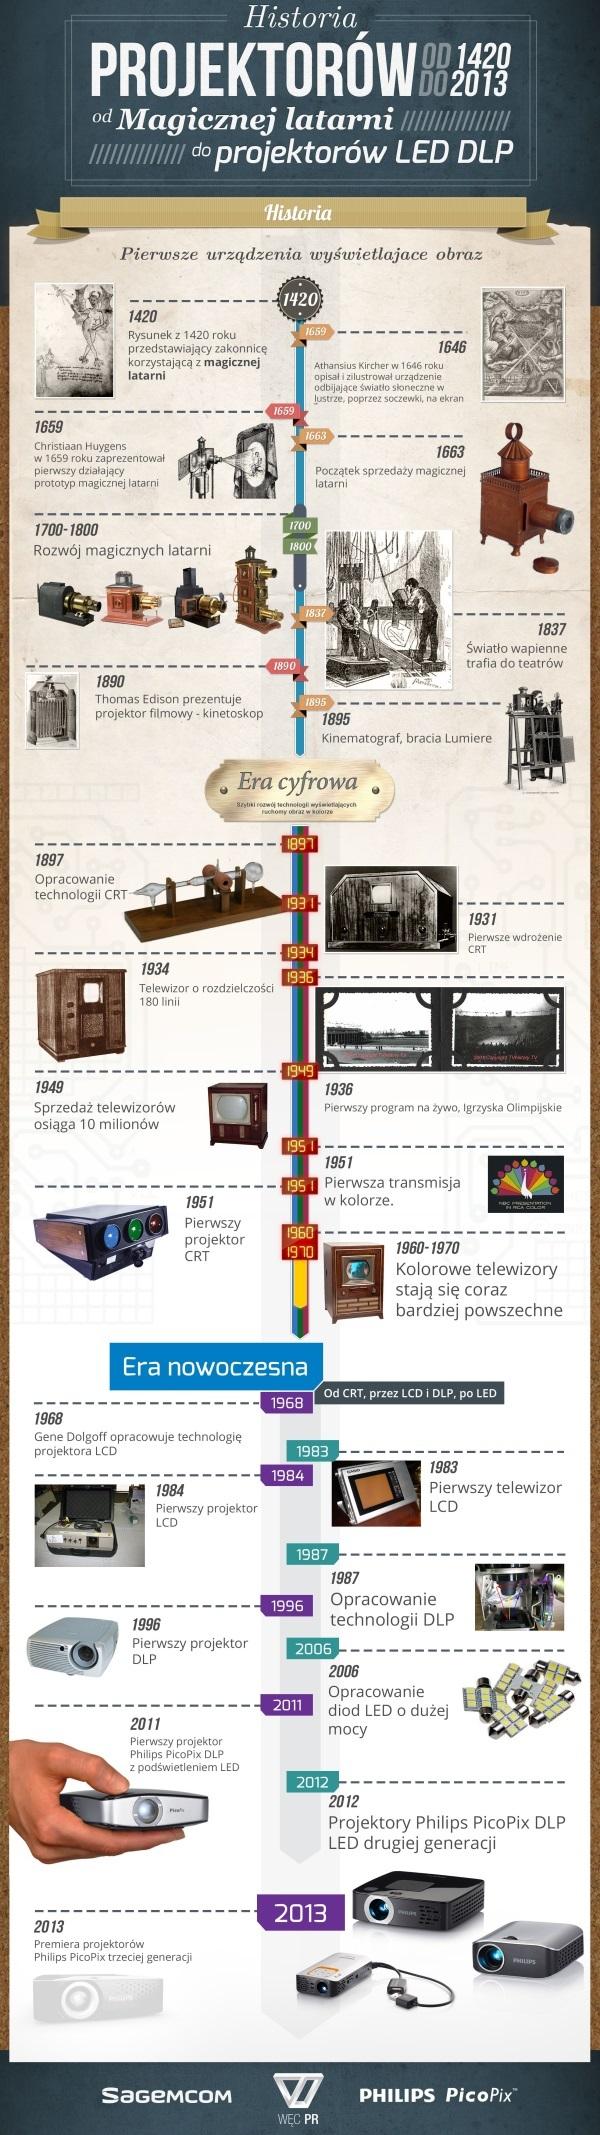 Historia projektorów